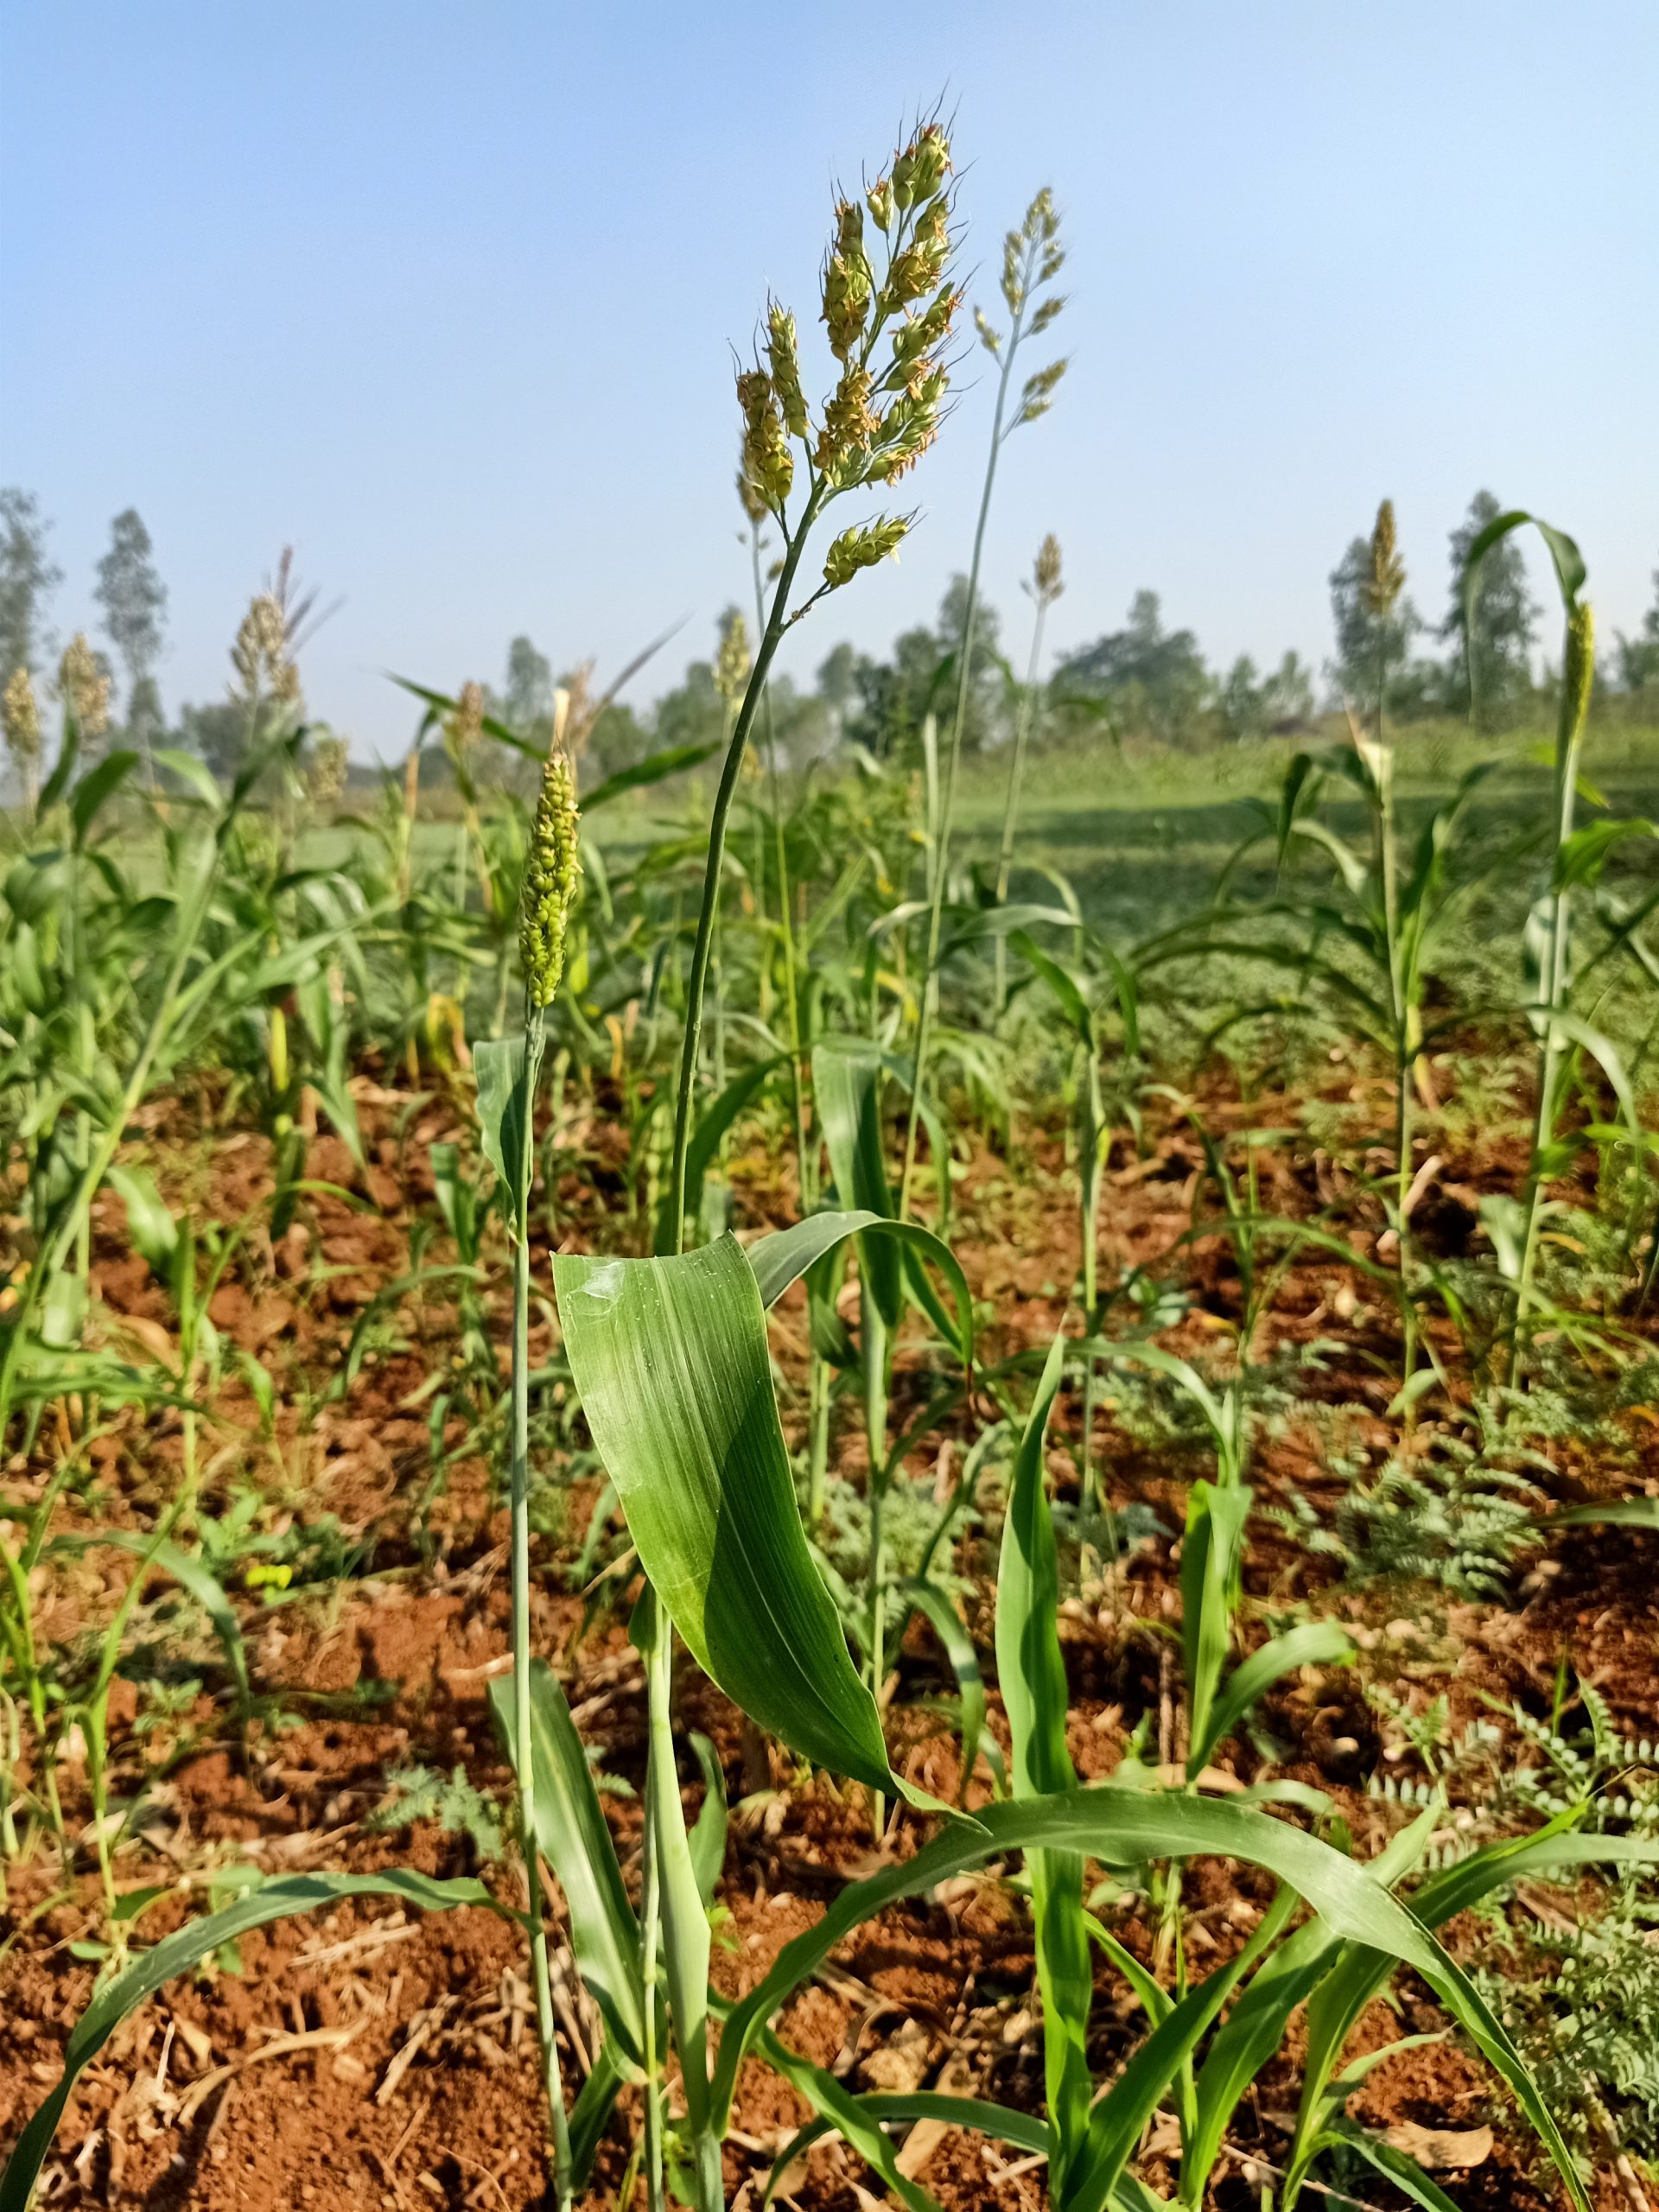 Wheat plant growing on farm